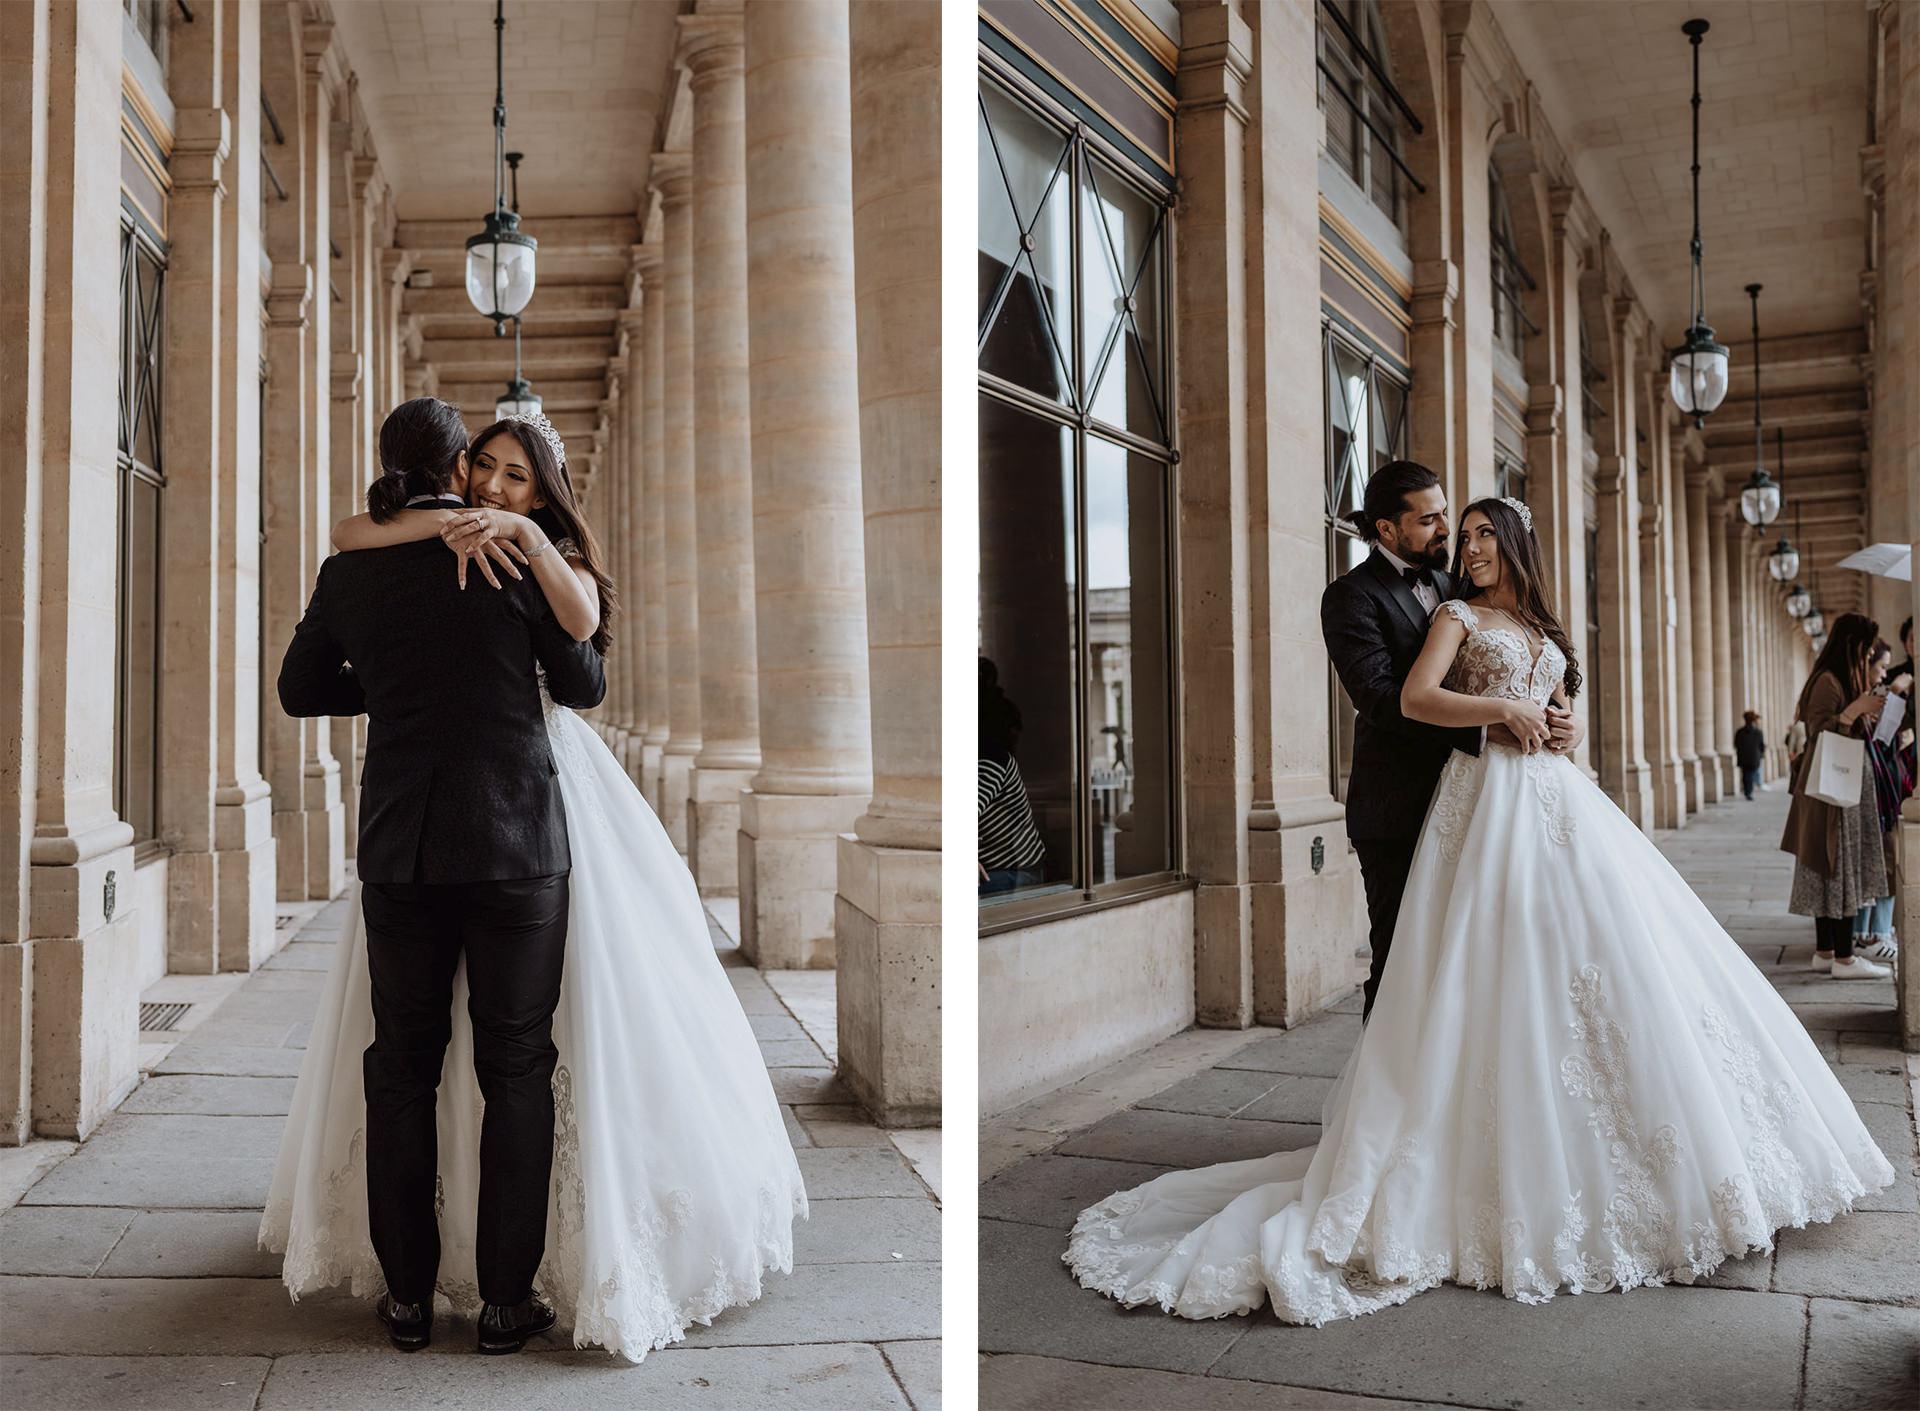 paris wedding proposal photo shoot